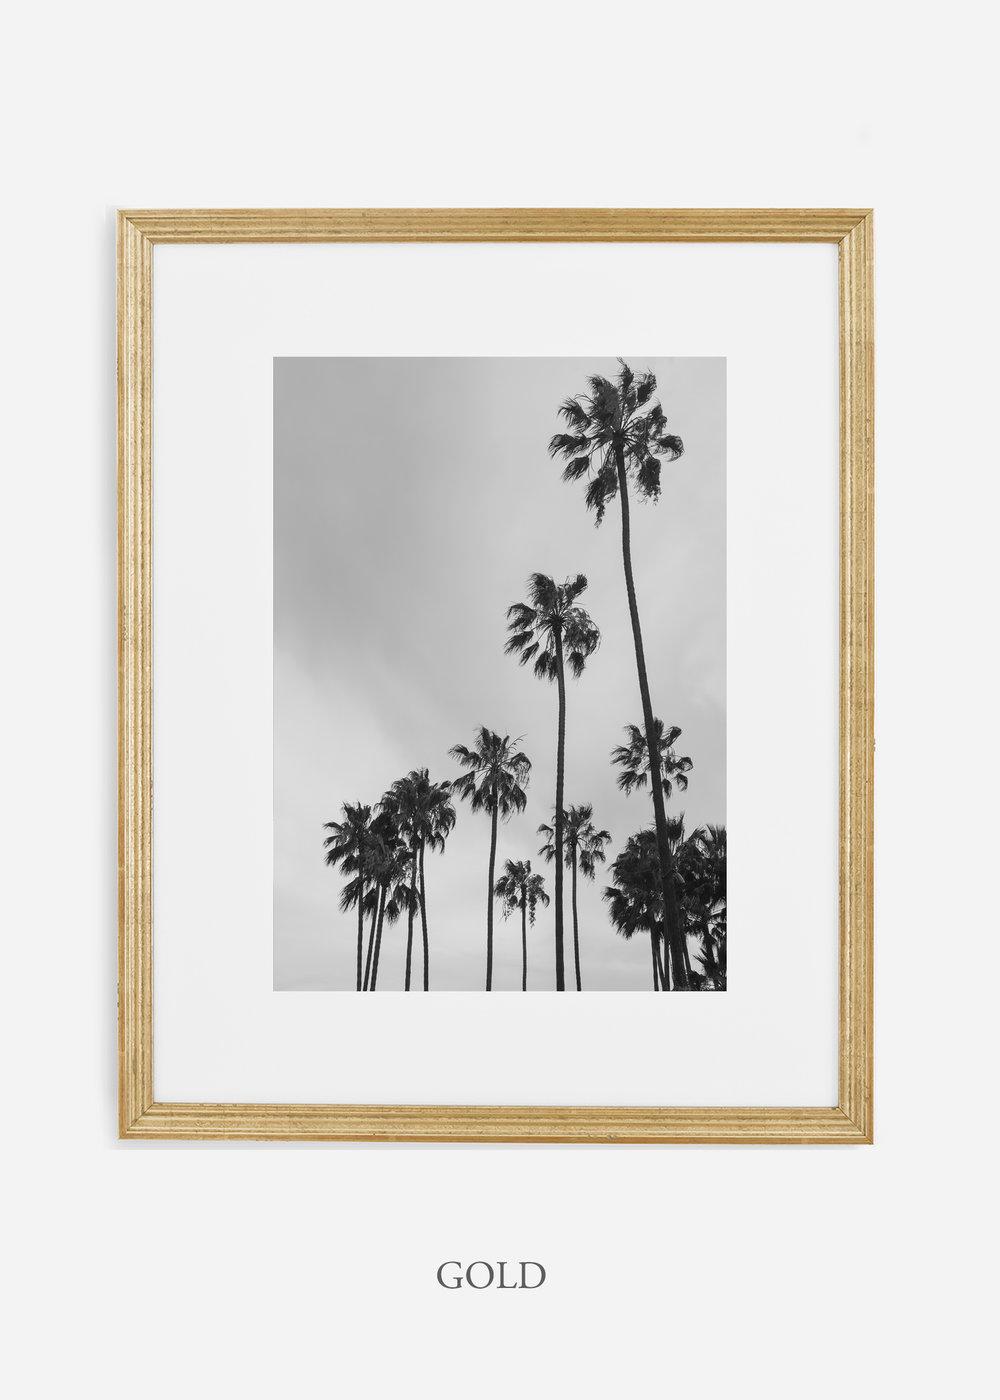 interiordesign_california_losangeles_palmtree_goldframe.jpg